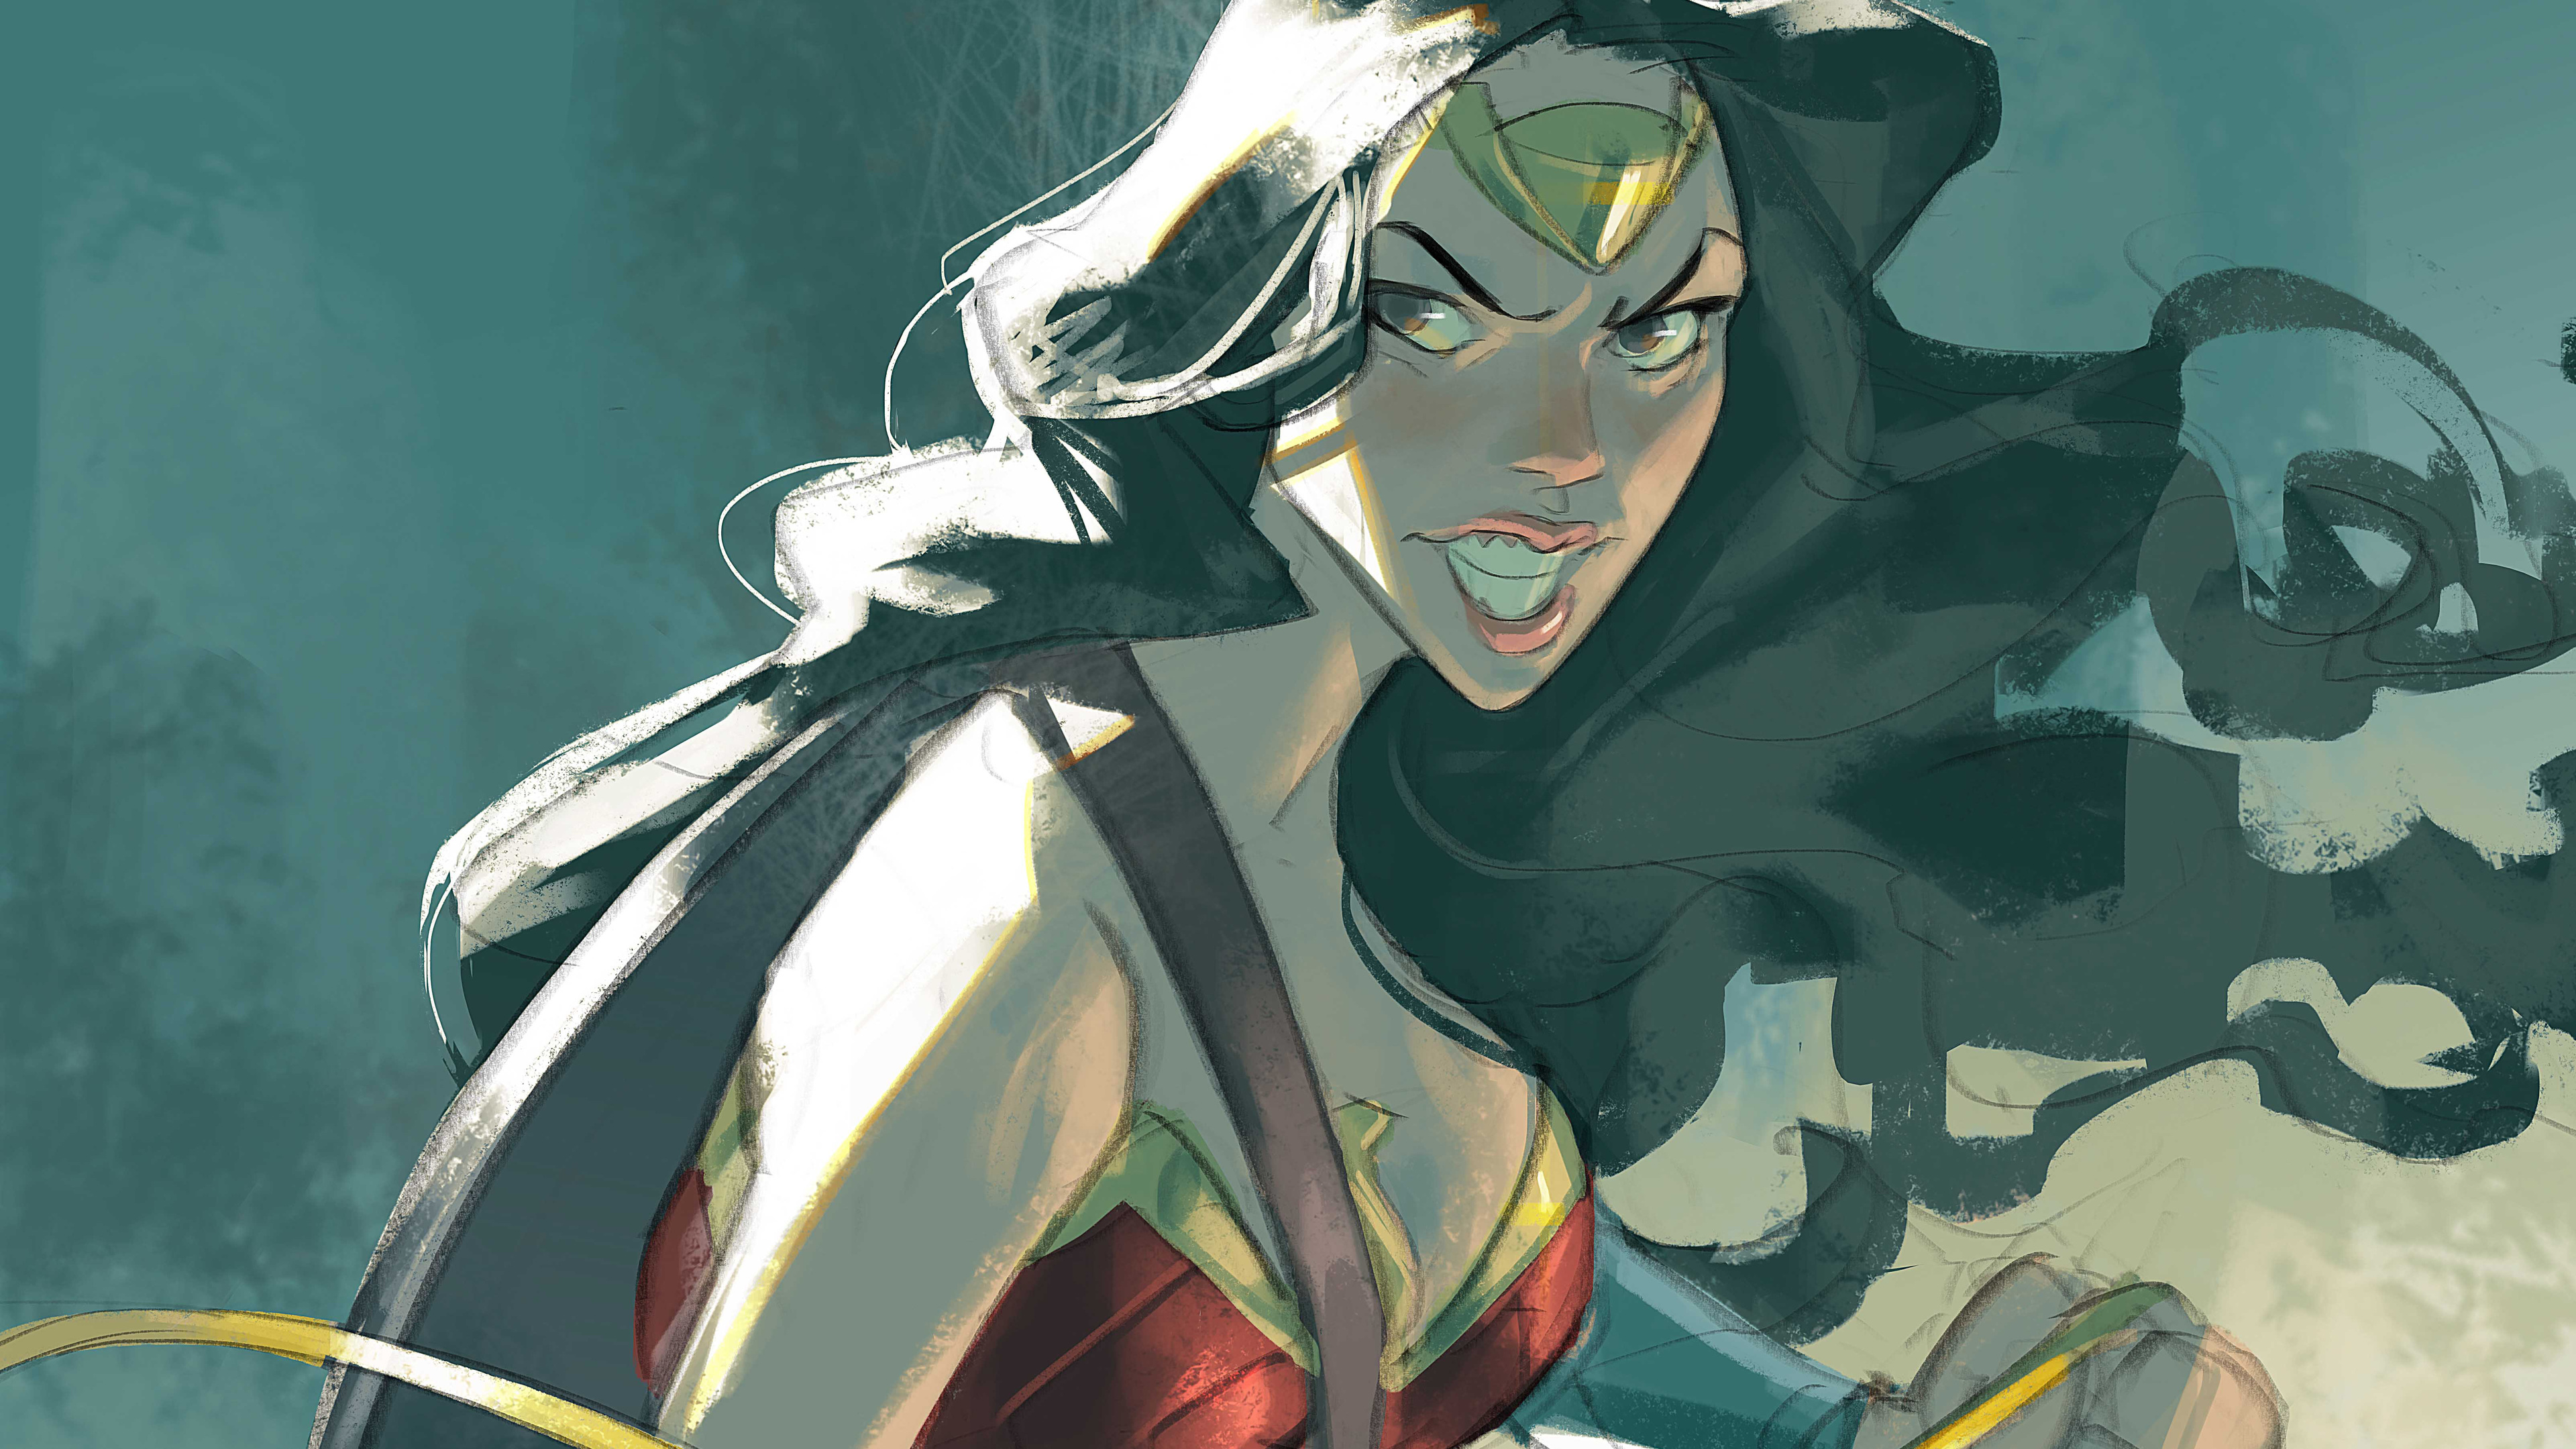 wonder woman 5k artwork 1536507642 - Wonder Woman 5k Artwork - wonder woman wallpapers, superheroes wallpapers, digital art wallpapers, deviantart wallpapers, artwork wallpapers, artist wallpapers, art wallpapers, 5k wallpapers, 4k-wallpapers